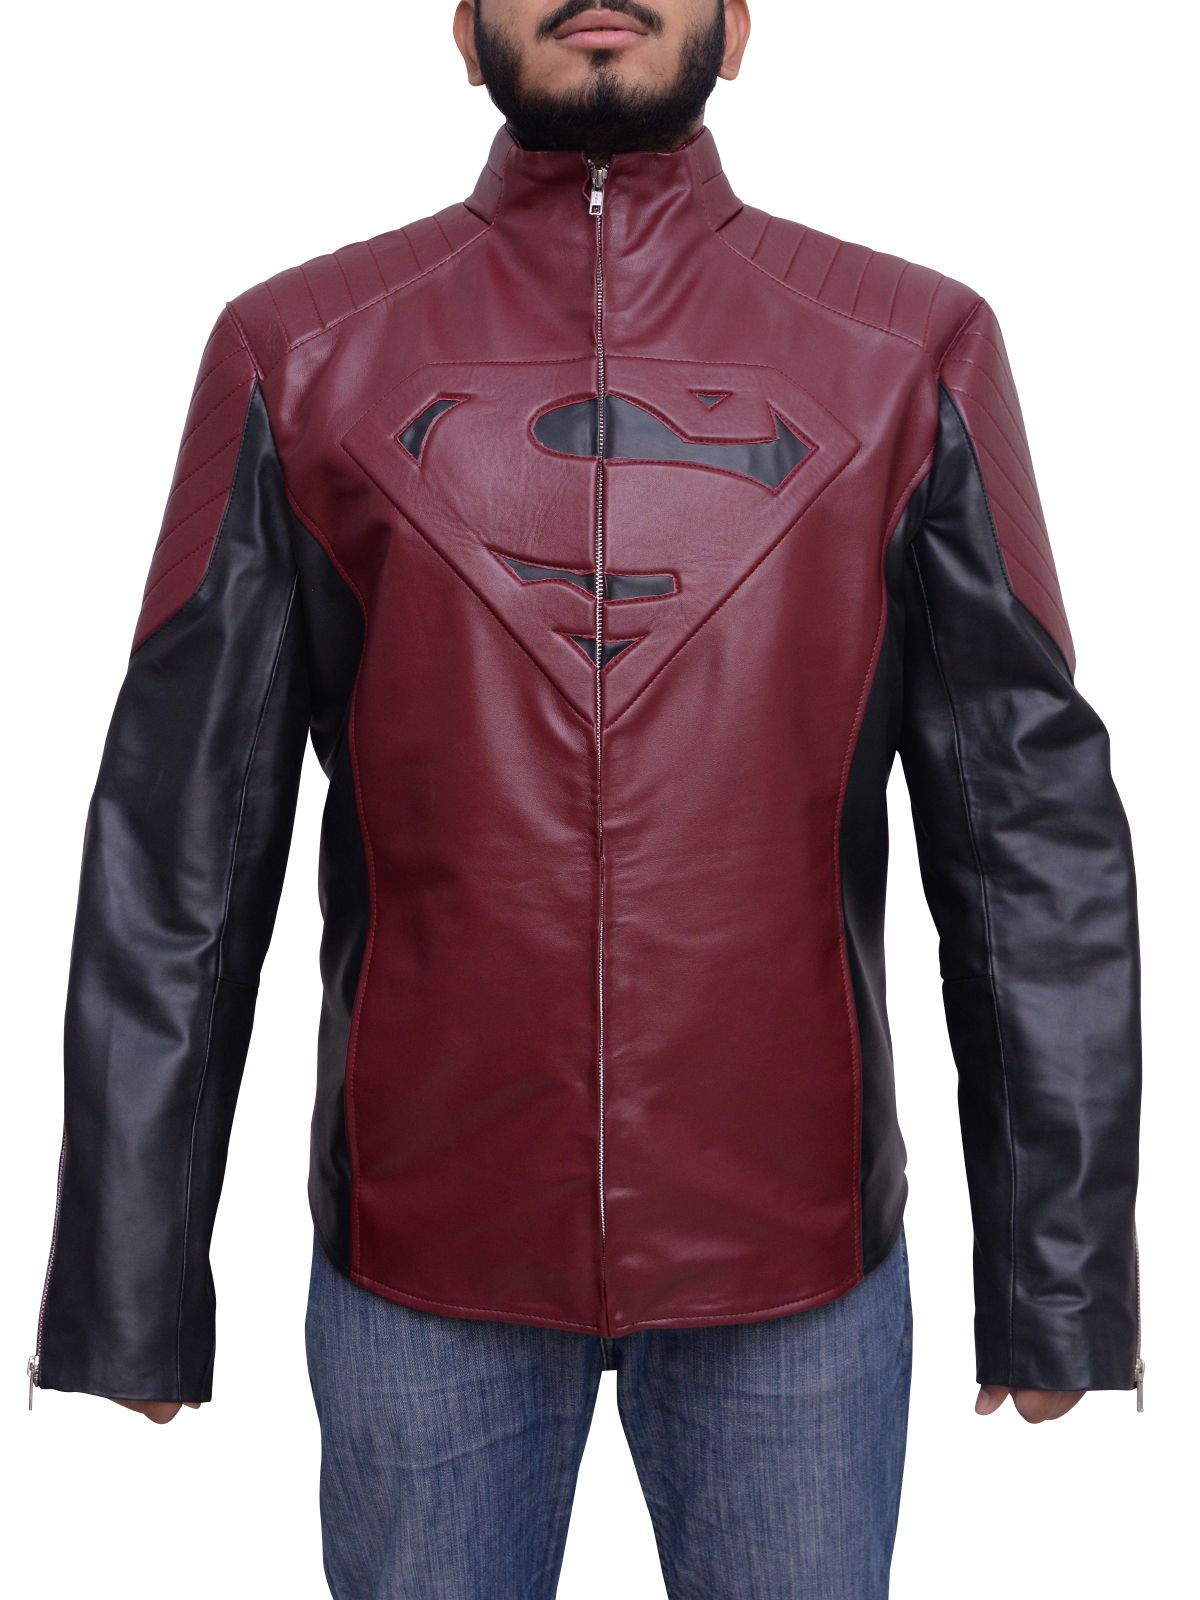 Majestic Superman Man Of Steel Smallville Black & Maroon